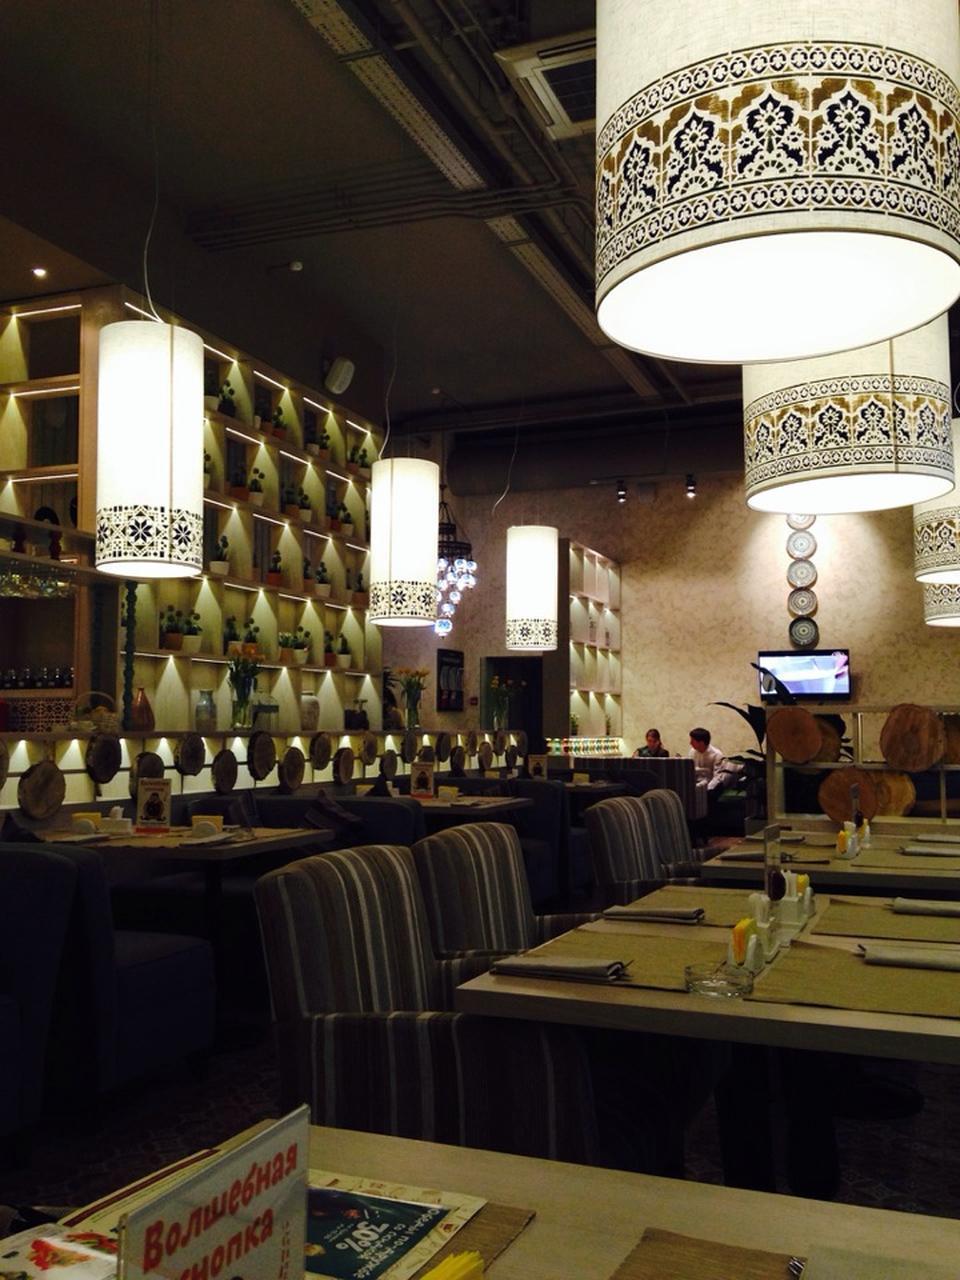 Восточное Кафе Лепешка в Королеве фото 29